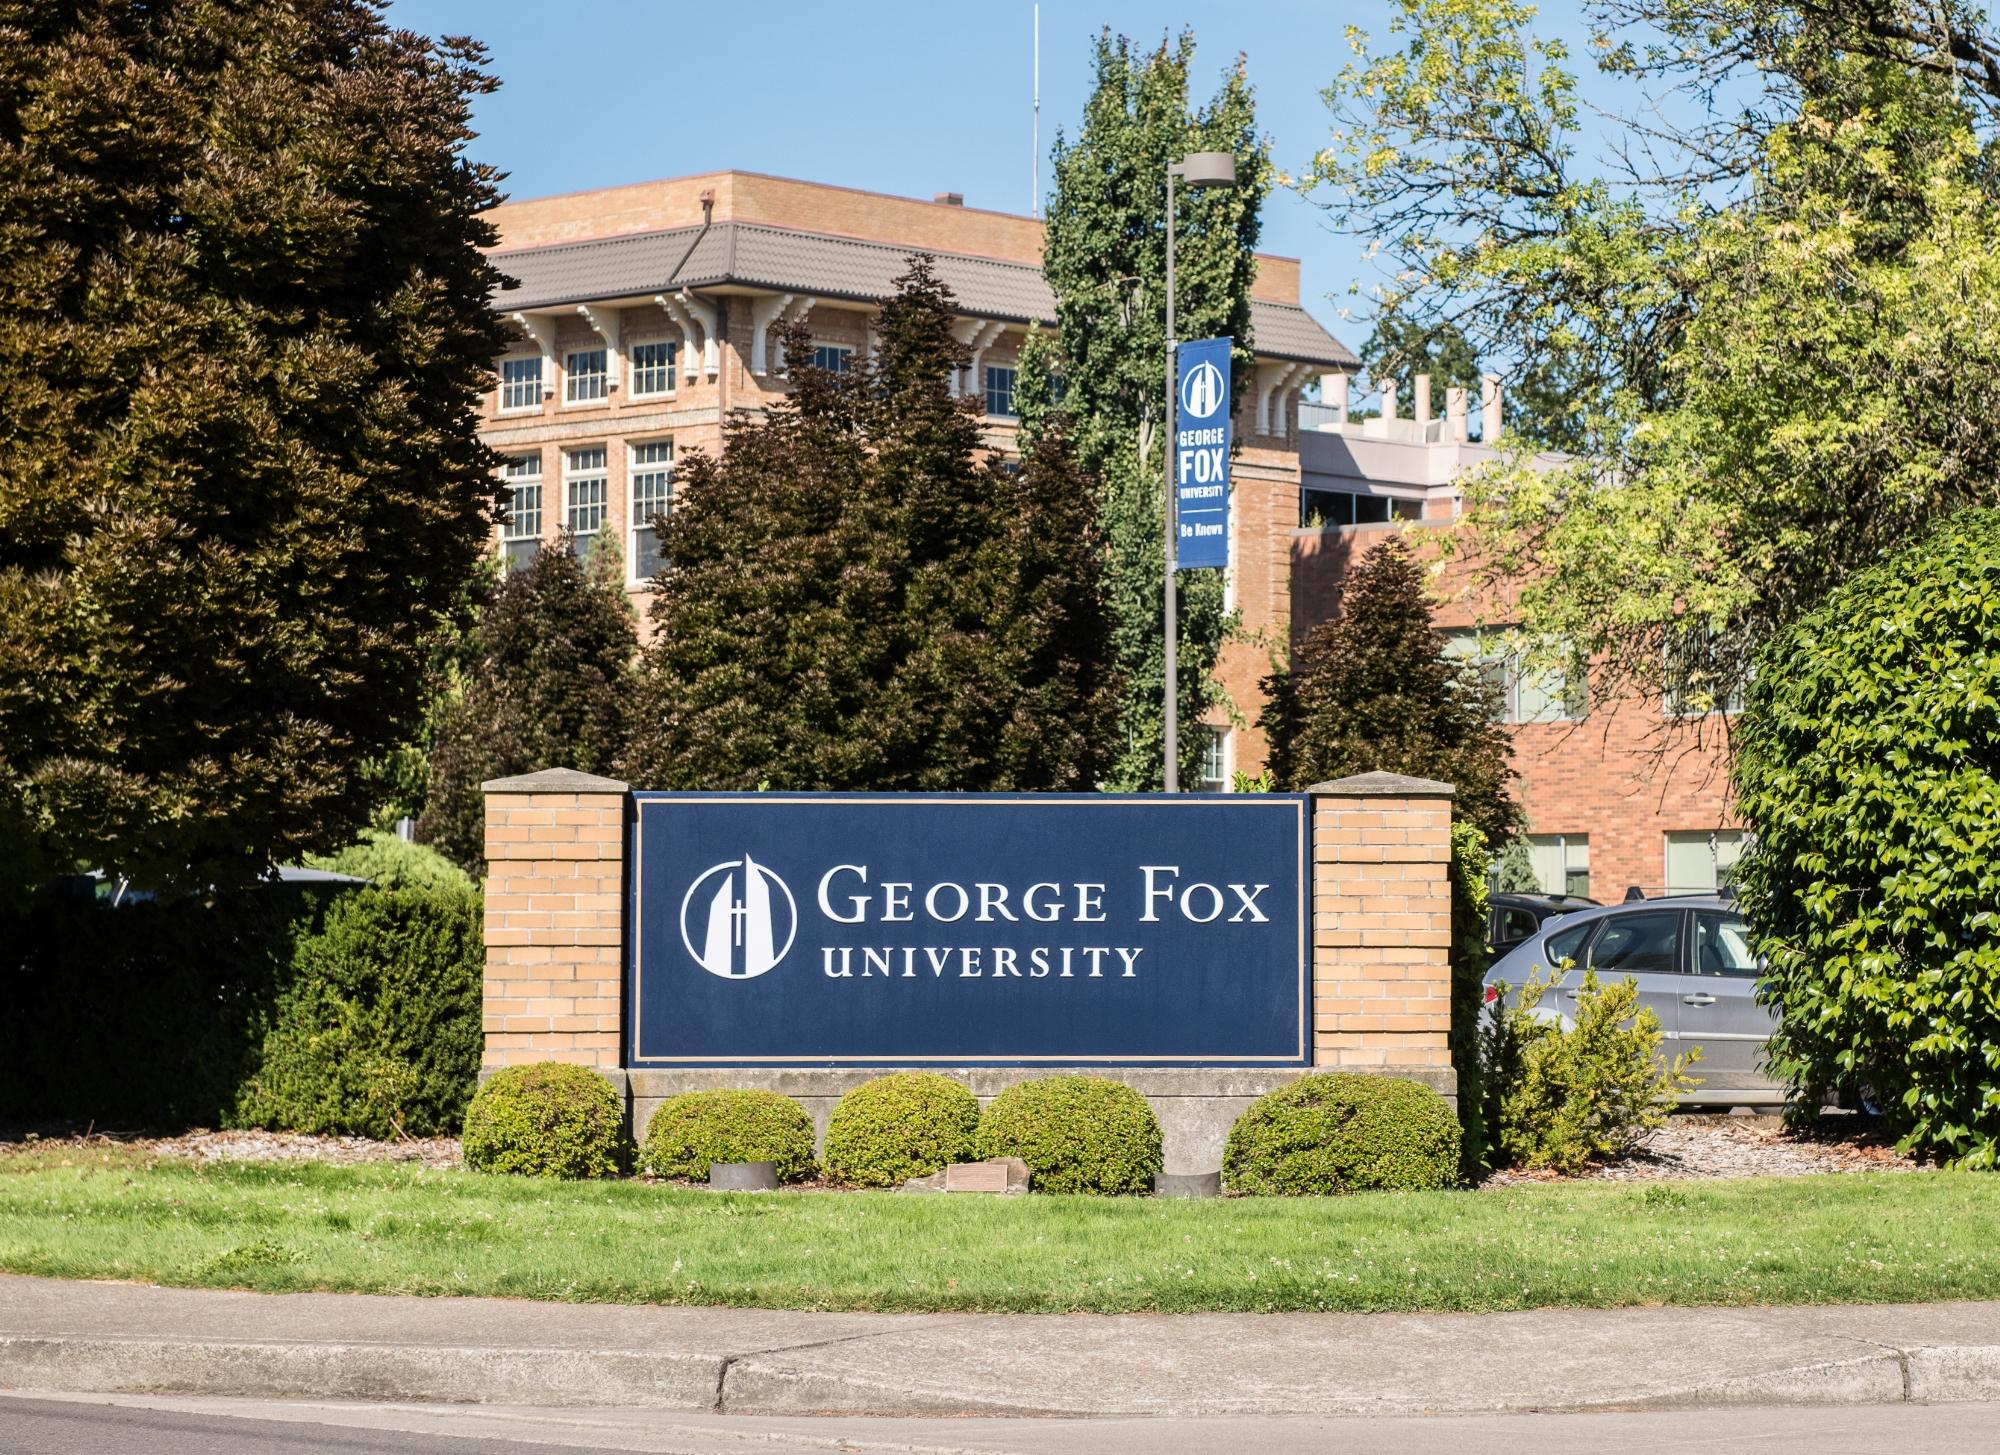 Newberg Gerorge Fox Univeristy